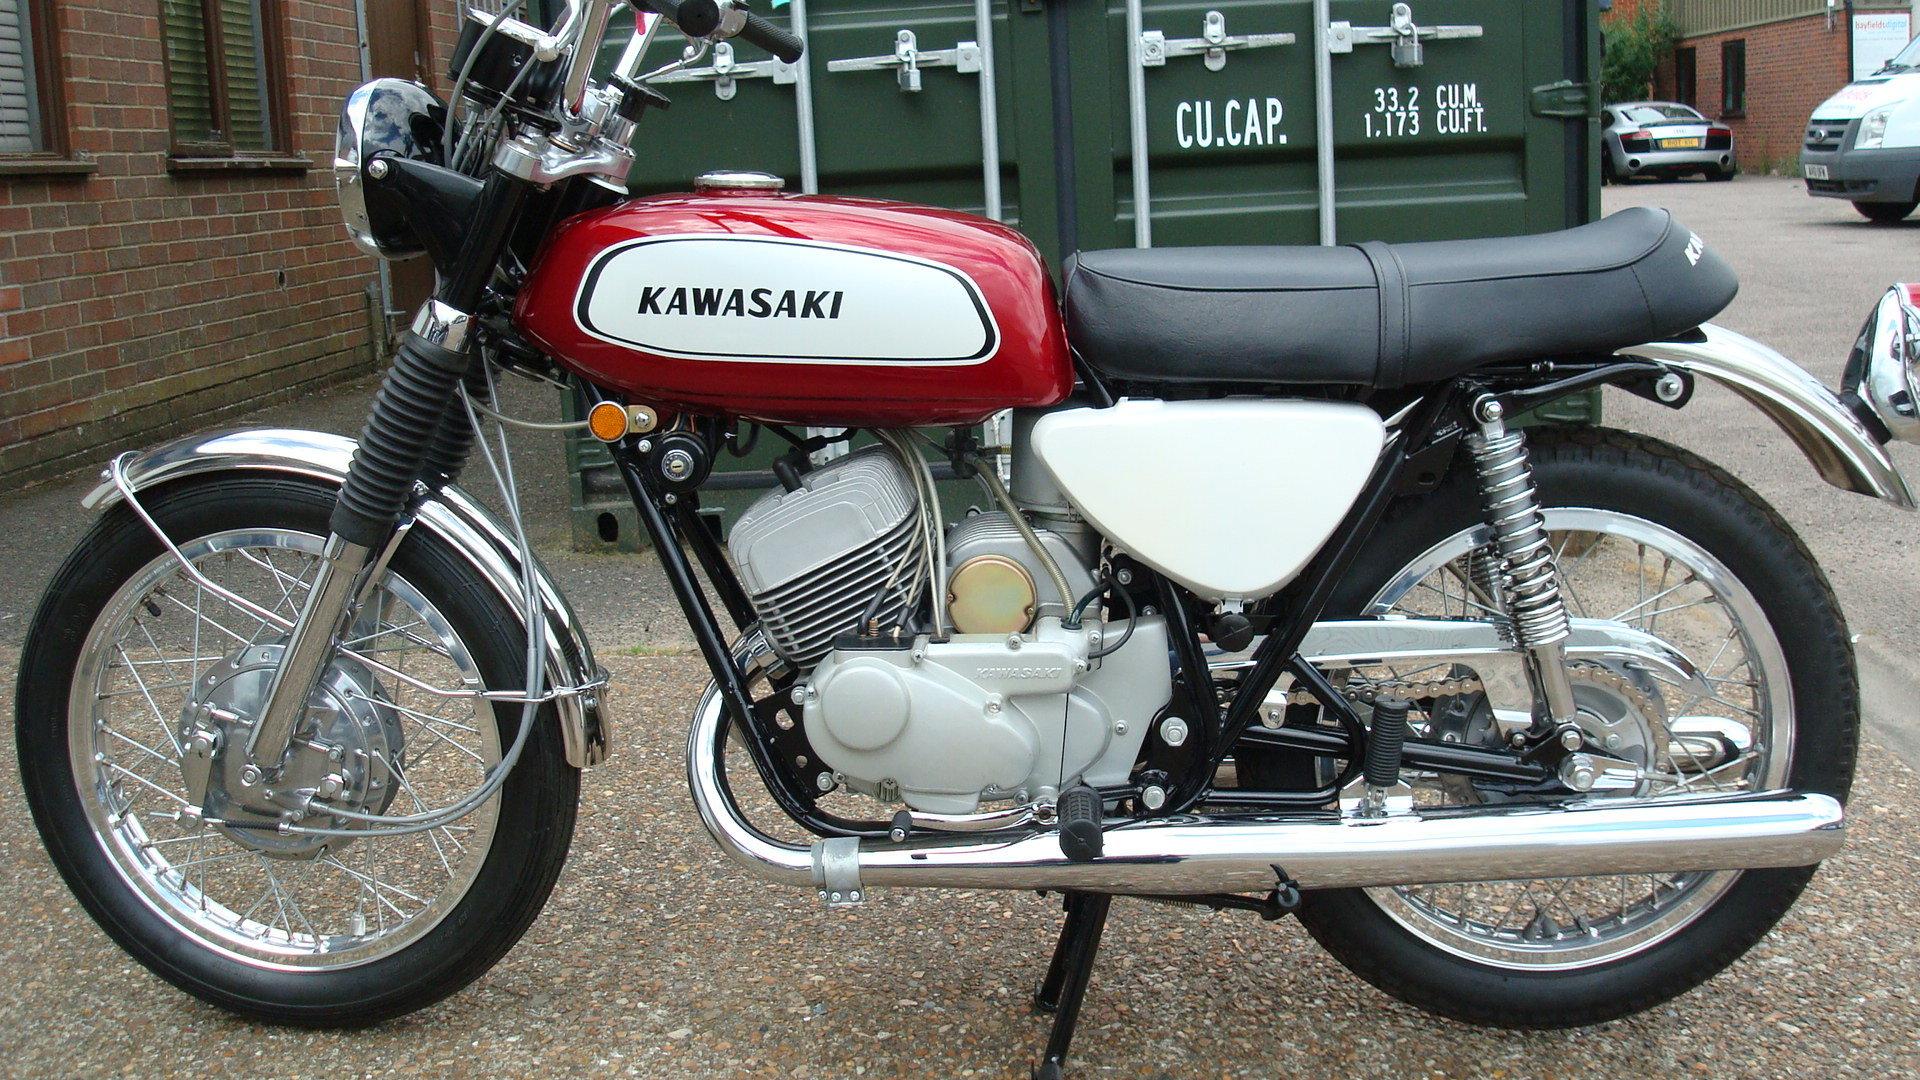 Kawasaki A1A Samurai 250 1970-J **SHOW STANDARD,RESTORED** For Sale (picture 10 of 10)